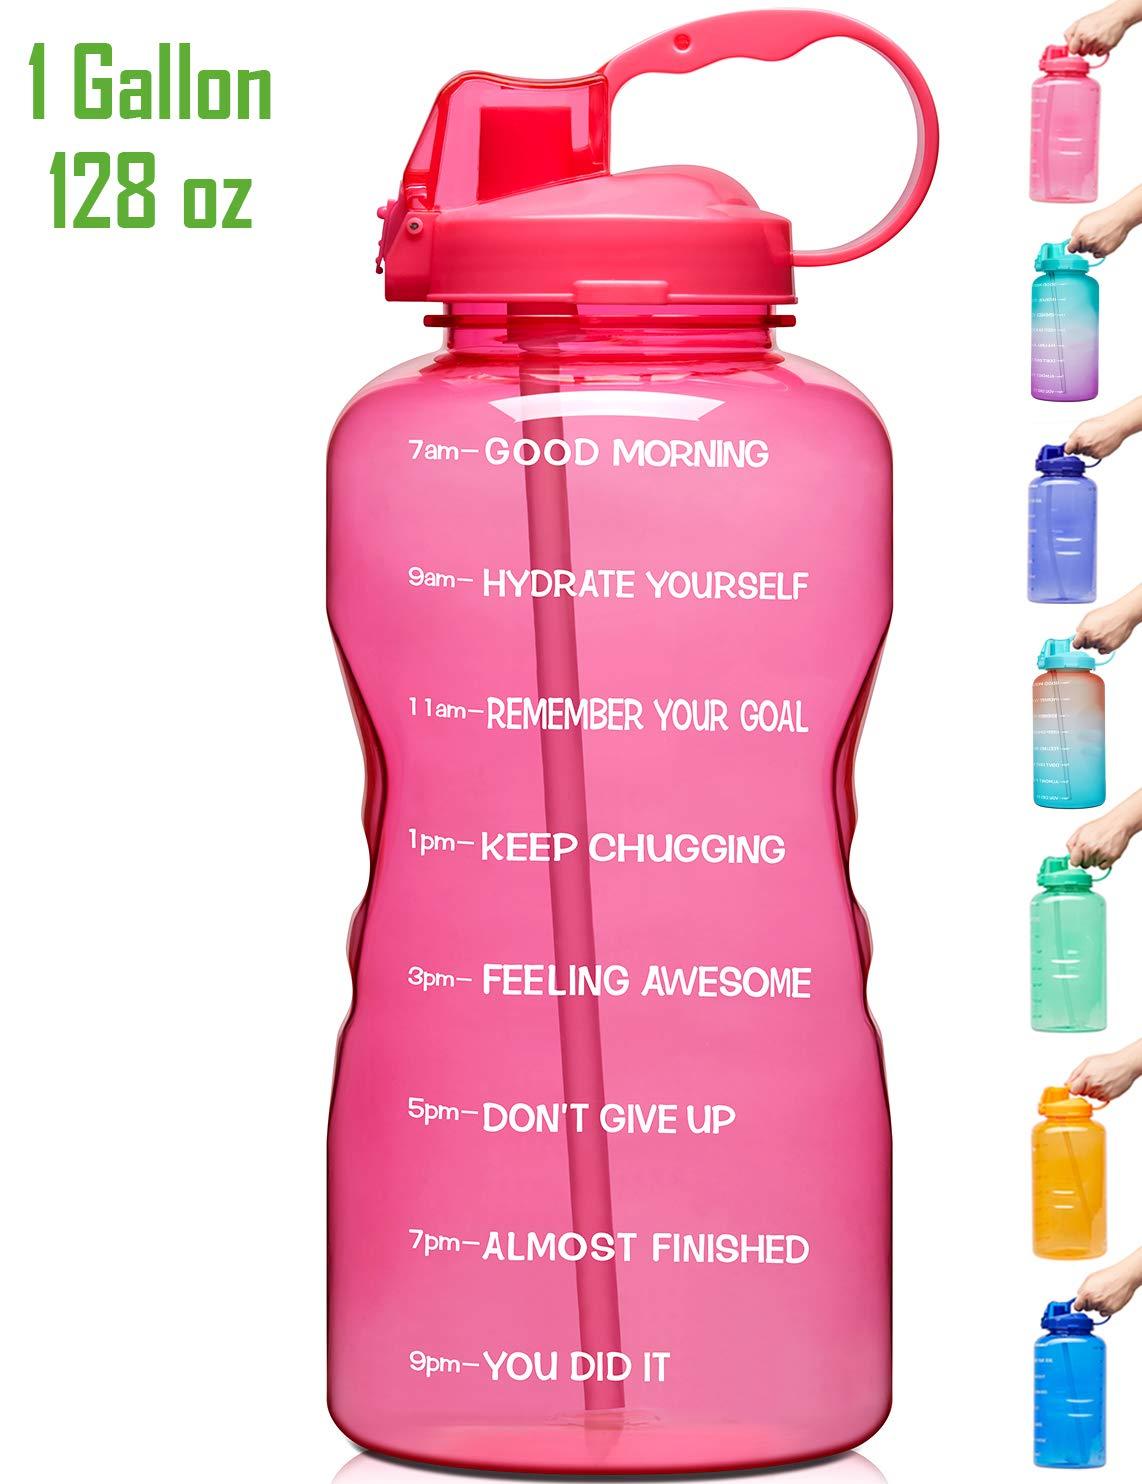 P2-Green//Pink Gradient Venture Pal Large 1 Gallon//128 OZ When Full